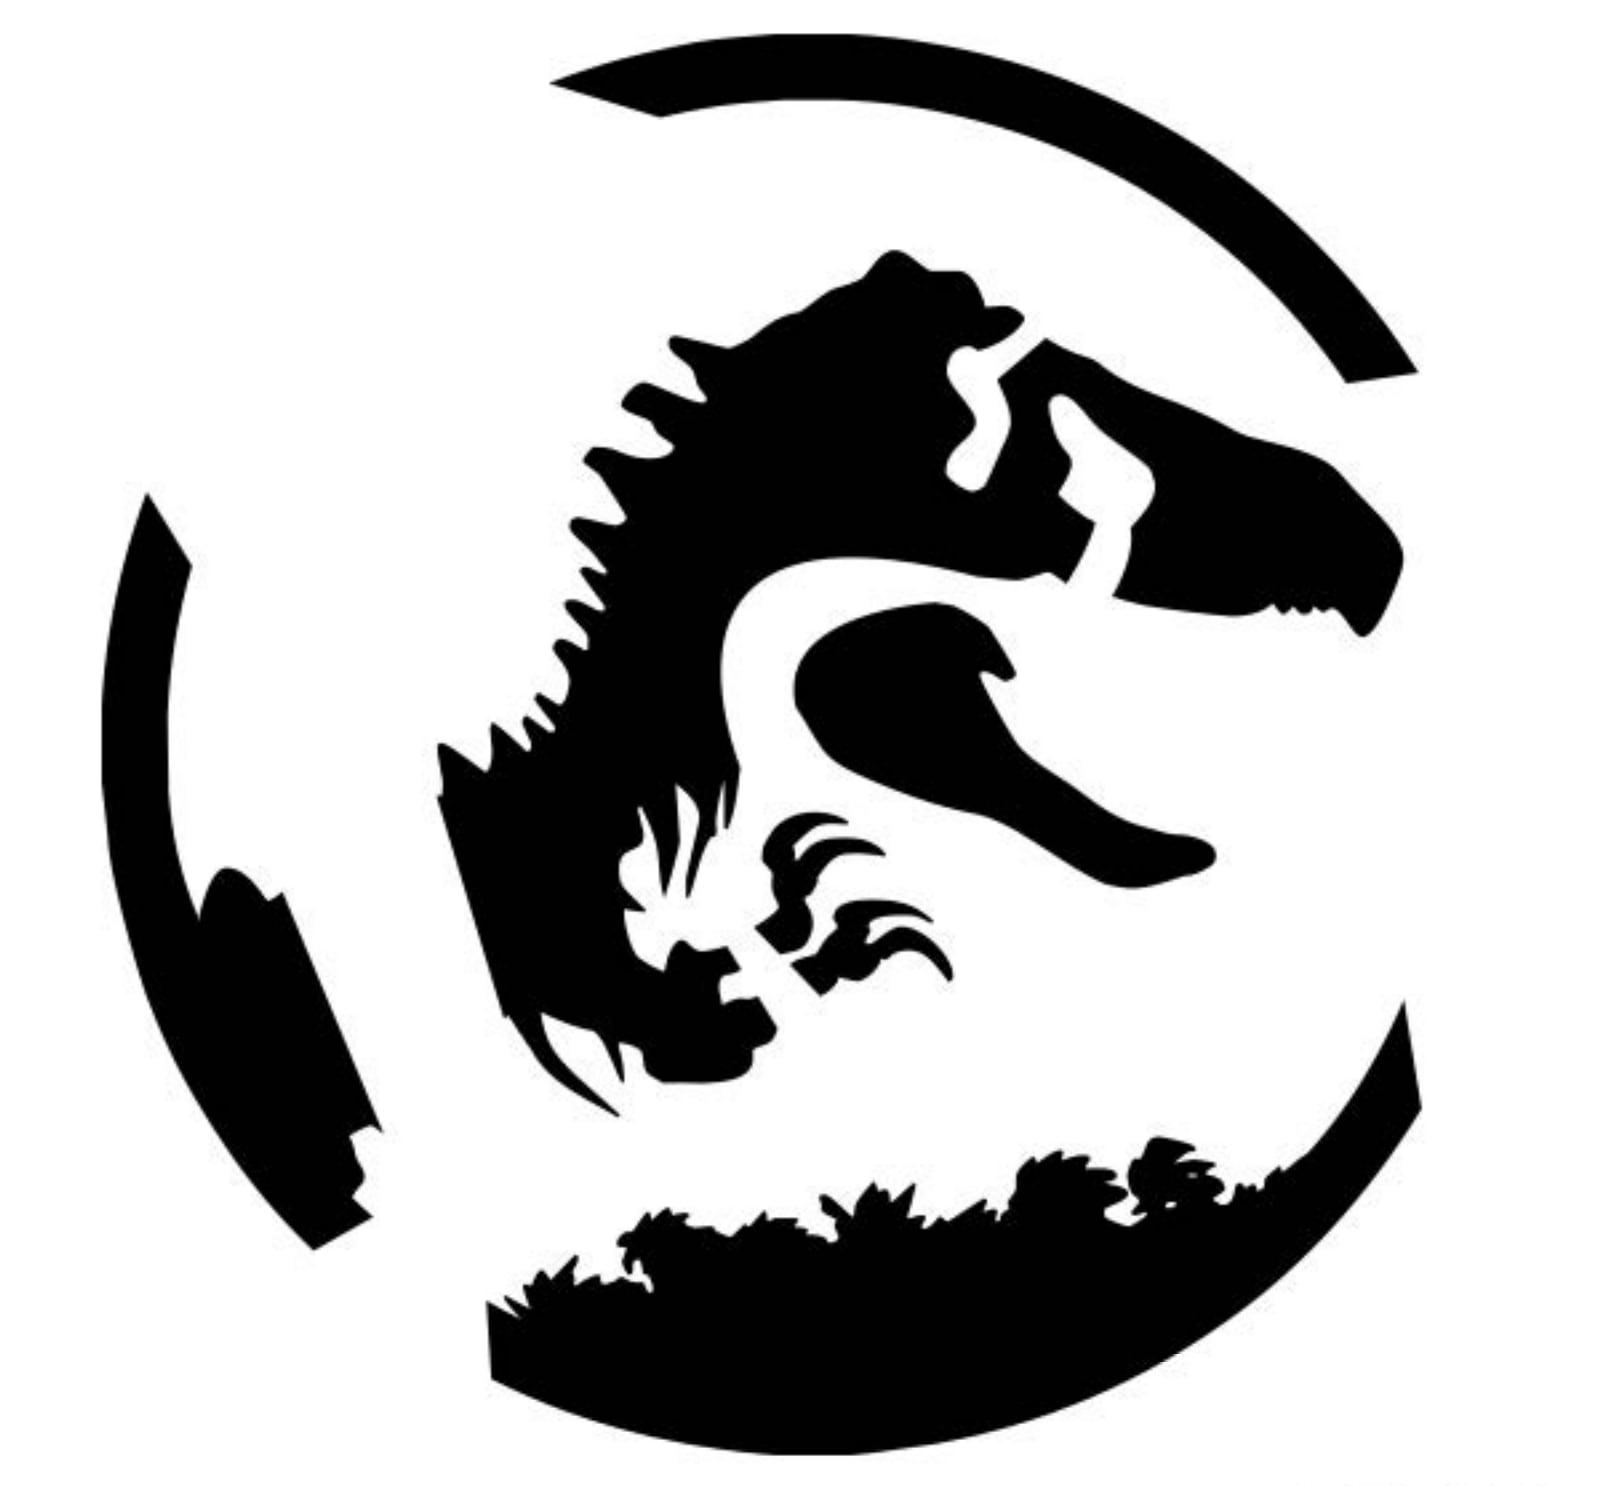 pumpkin template jurassic park  Jurassic Park | 6+ Free Stencils That Will Take Your ...